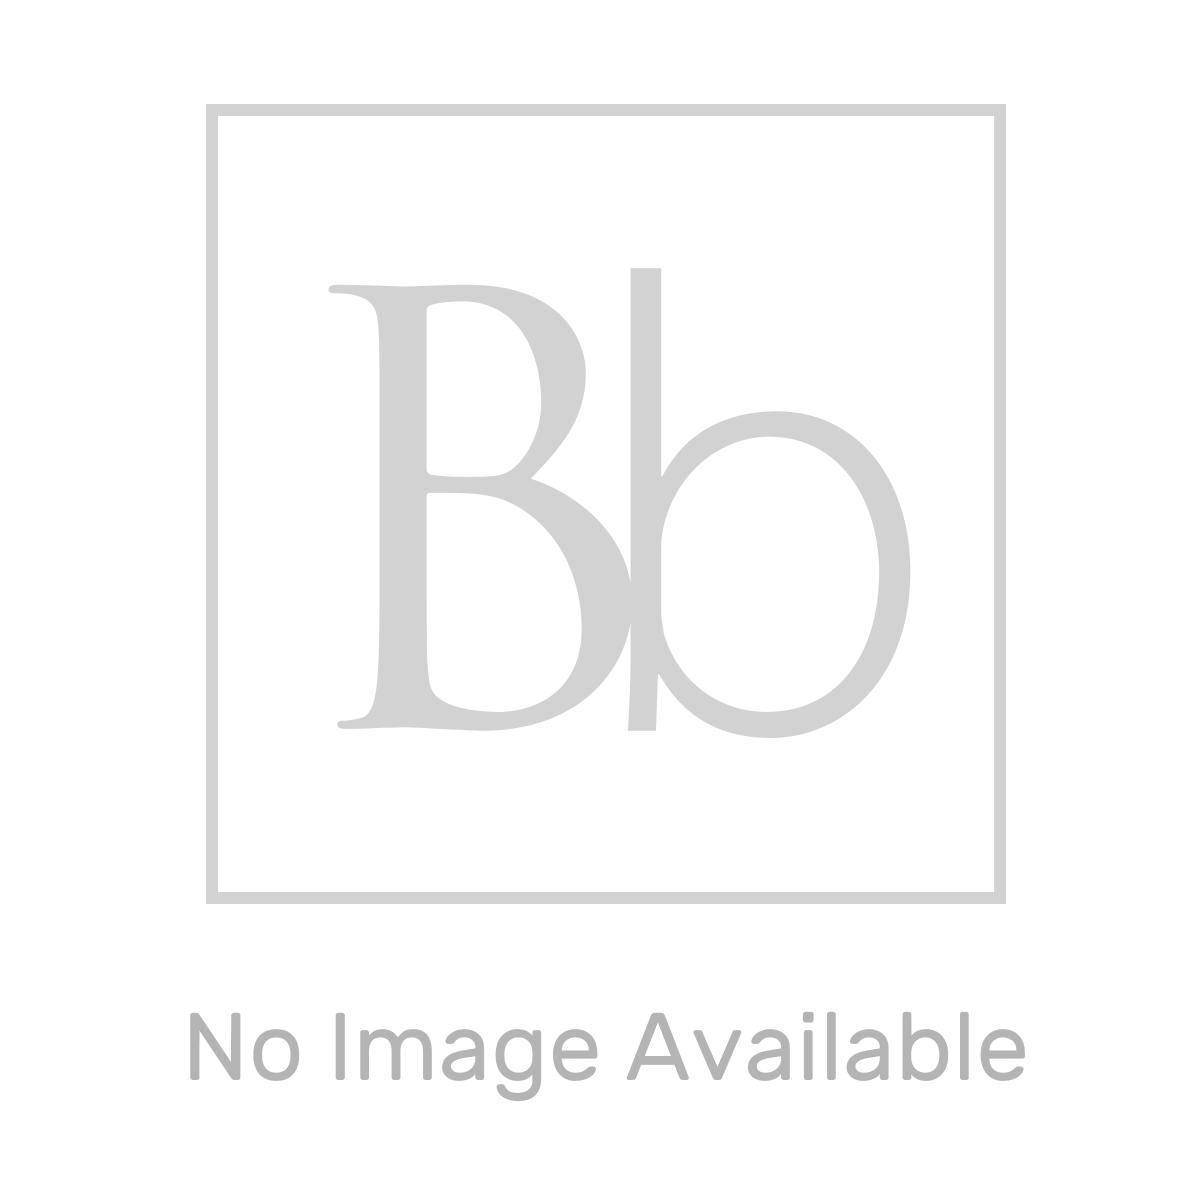 RAK Surface Off White Lappato Tile 750 x 750mm